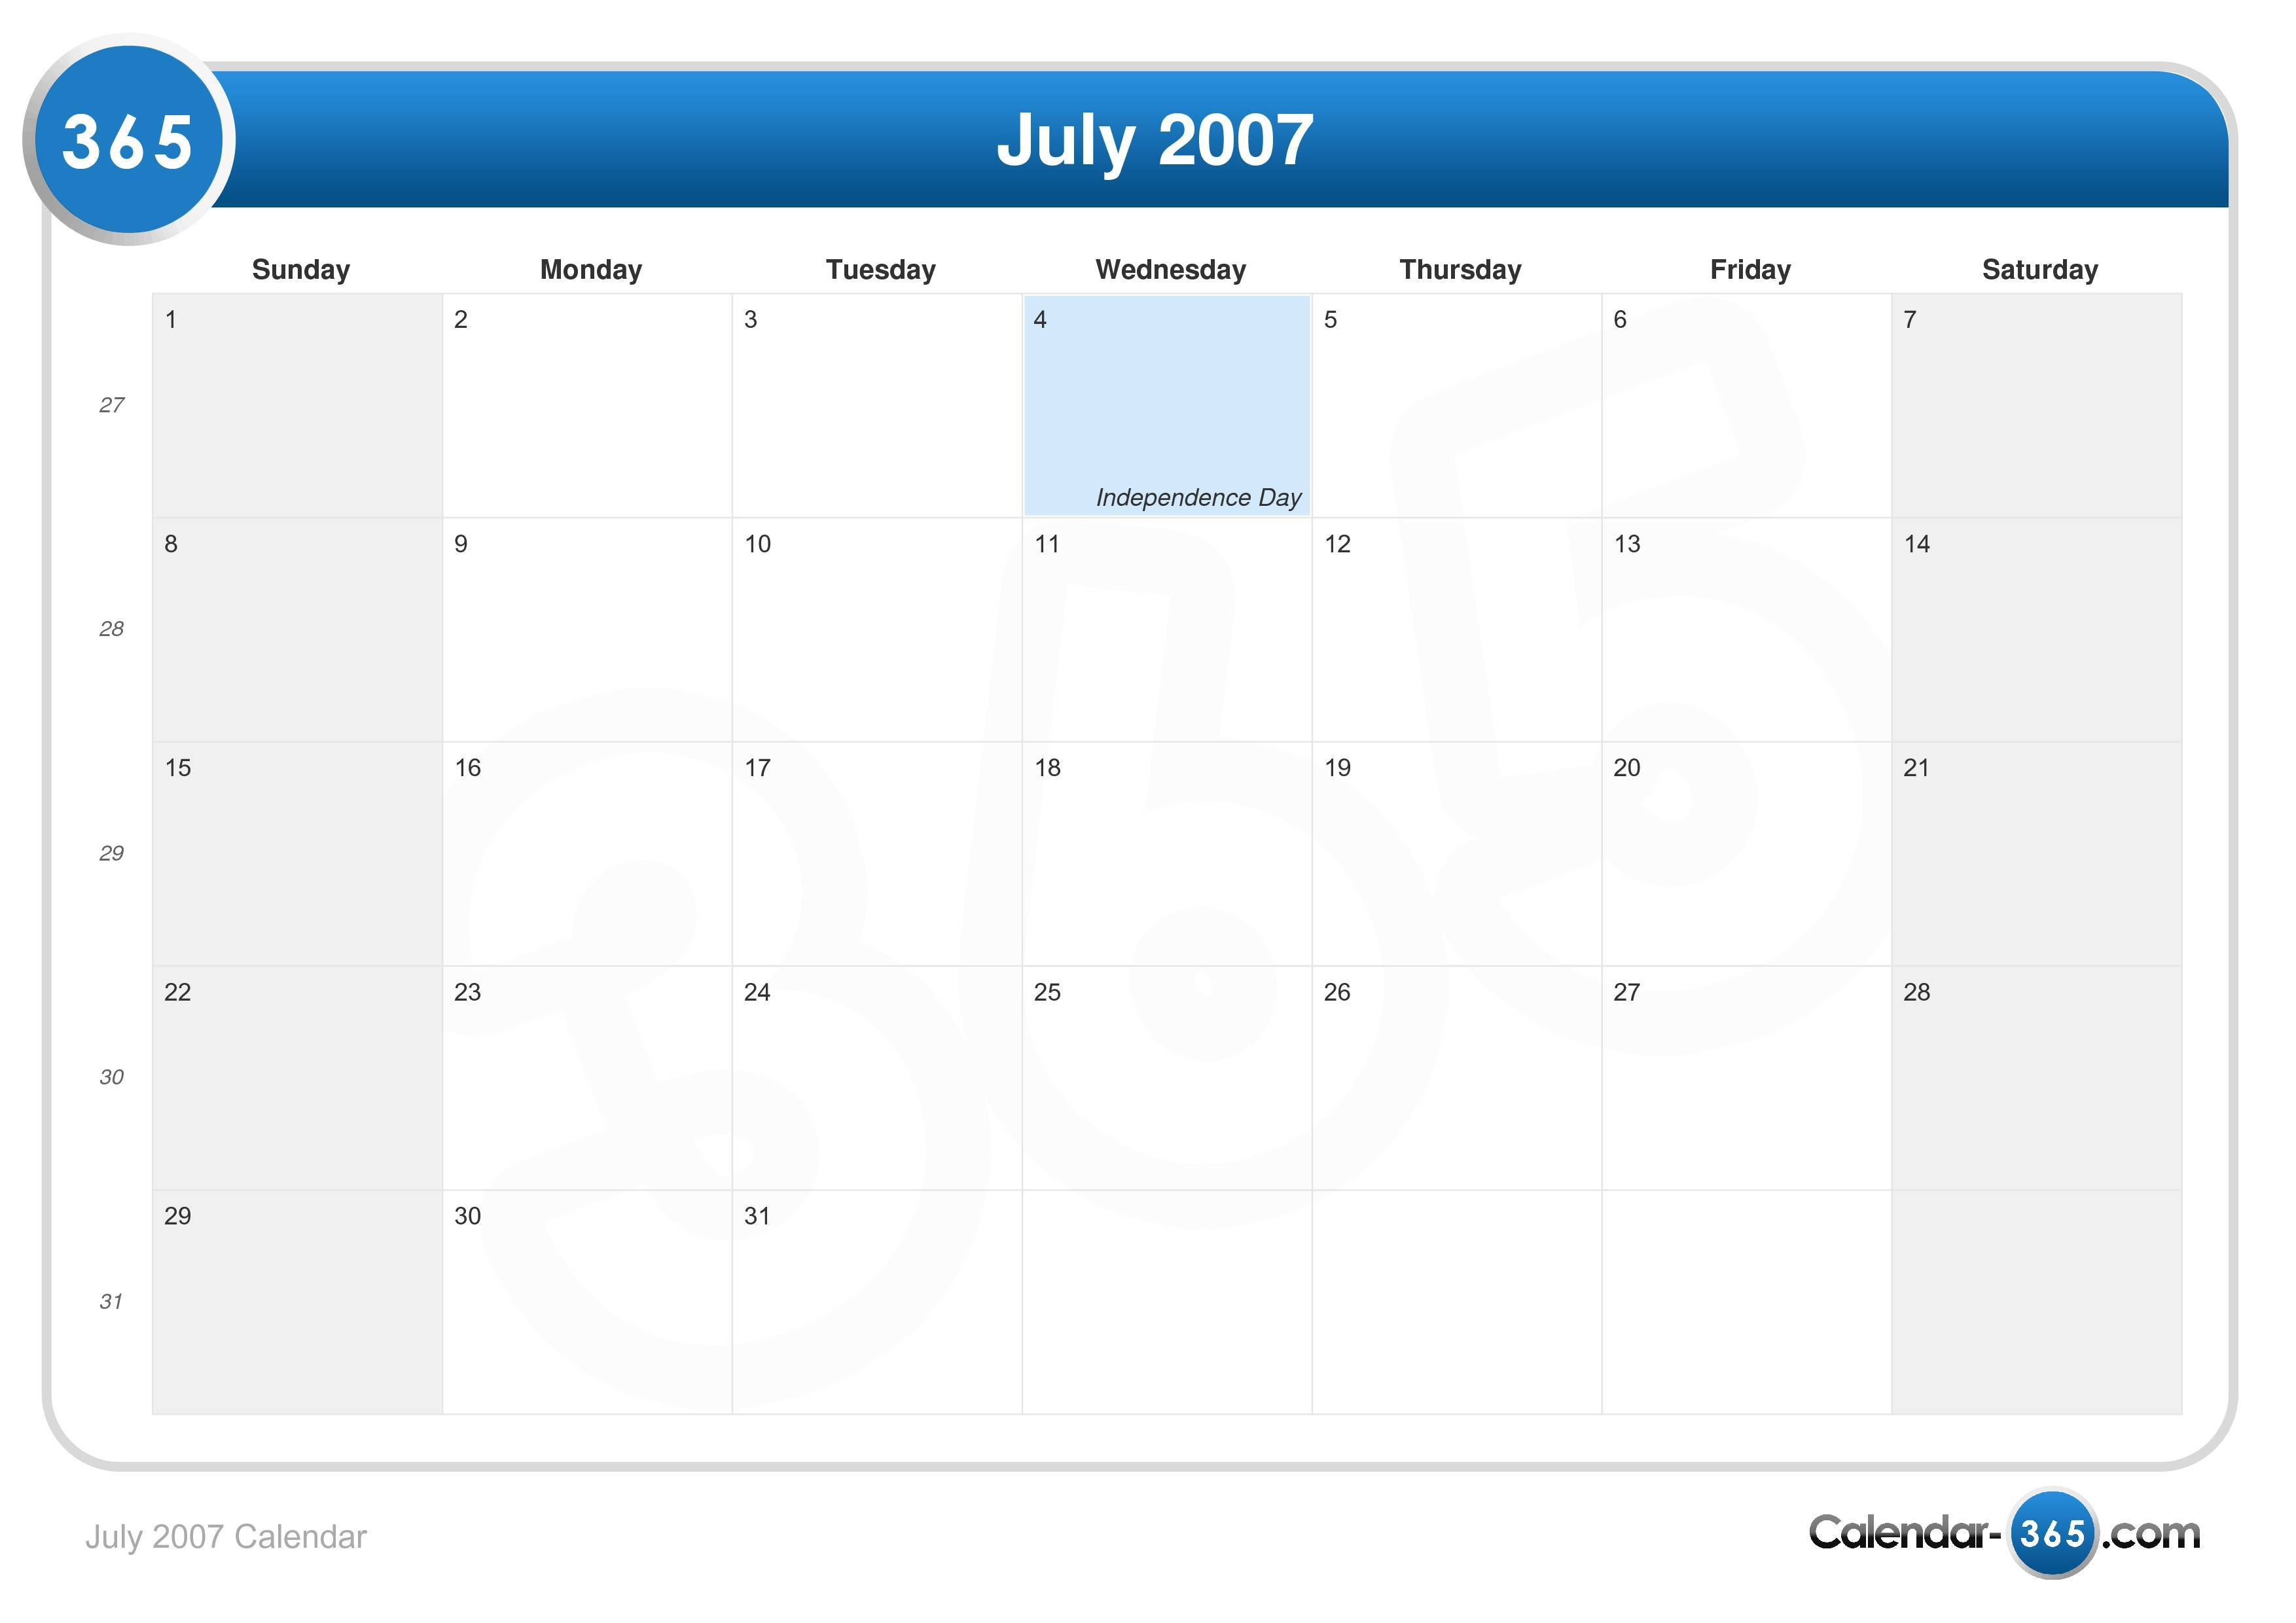 July 2007 Calendar